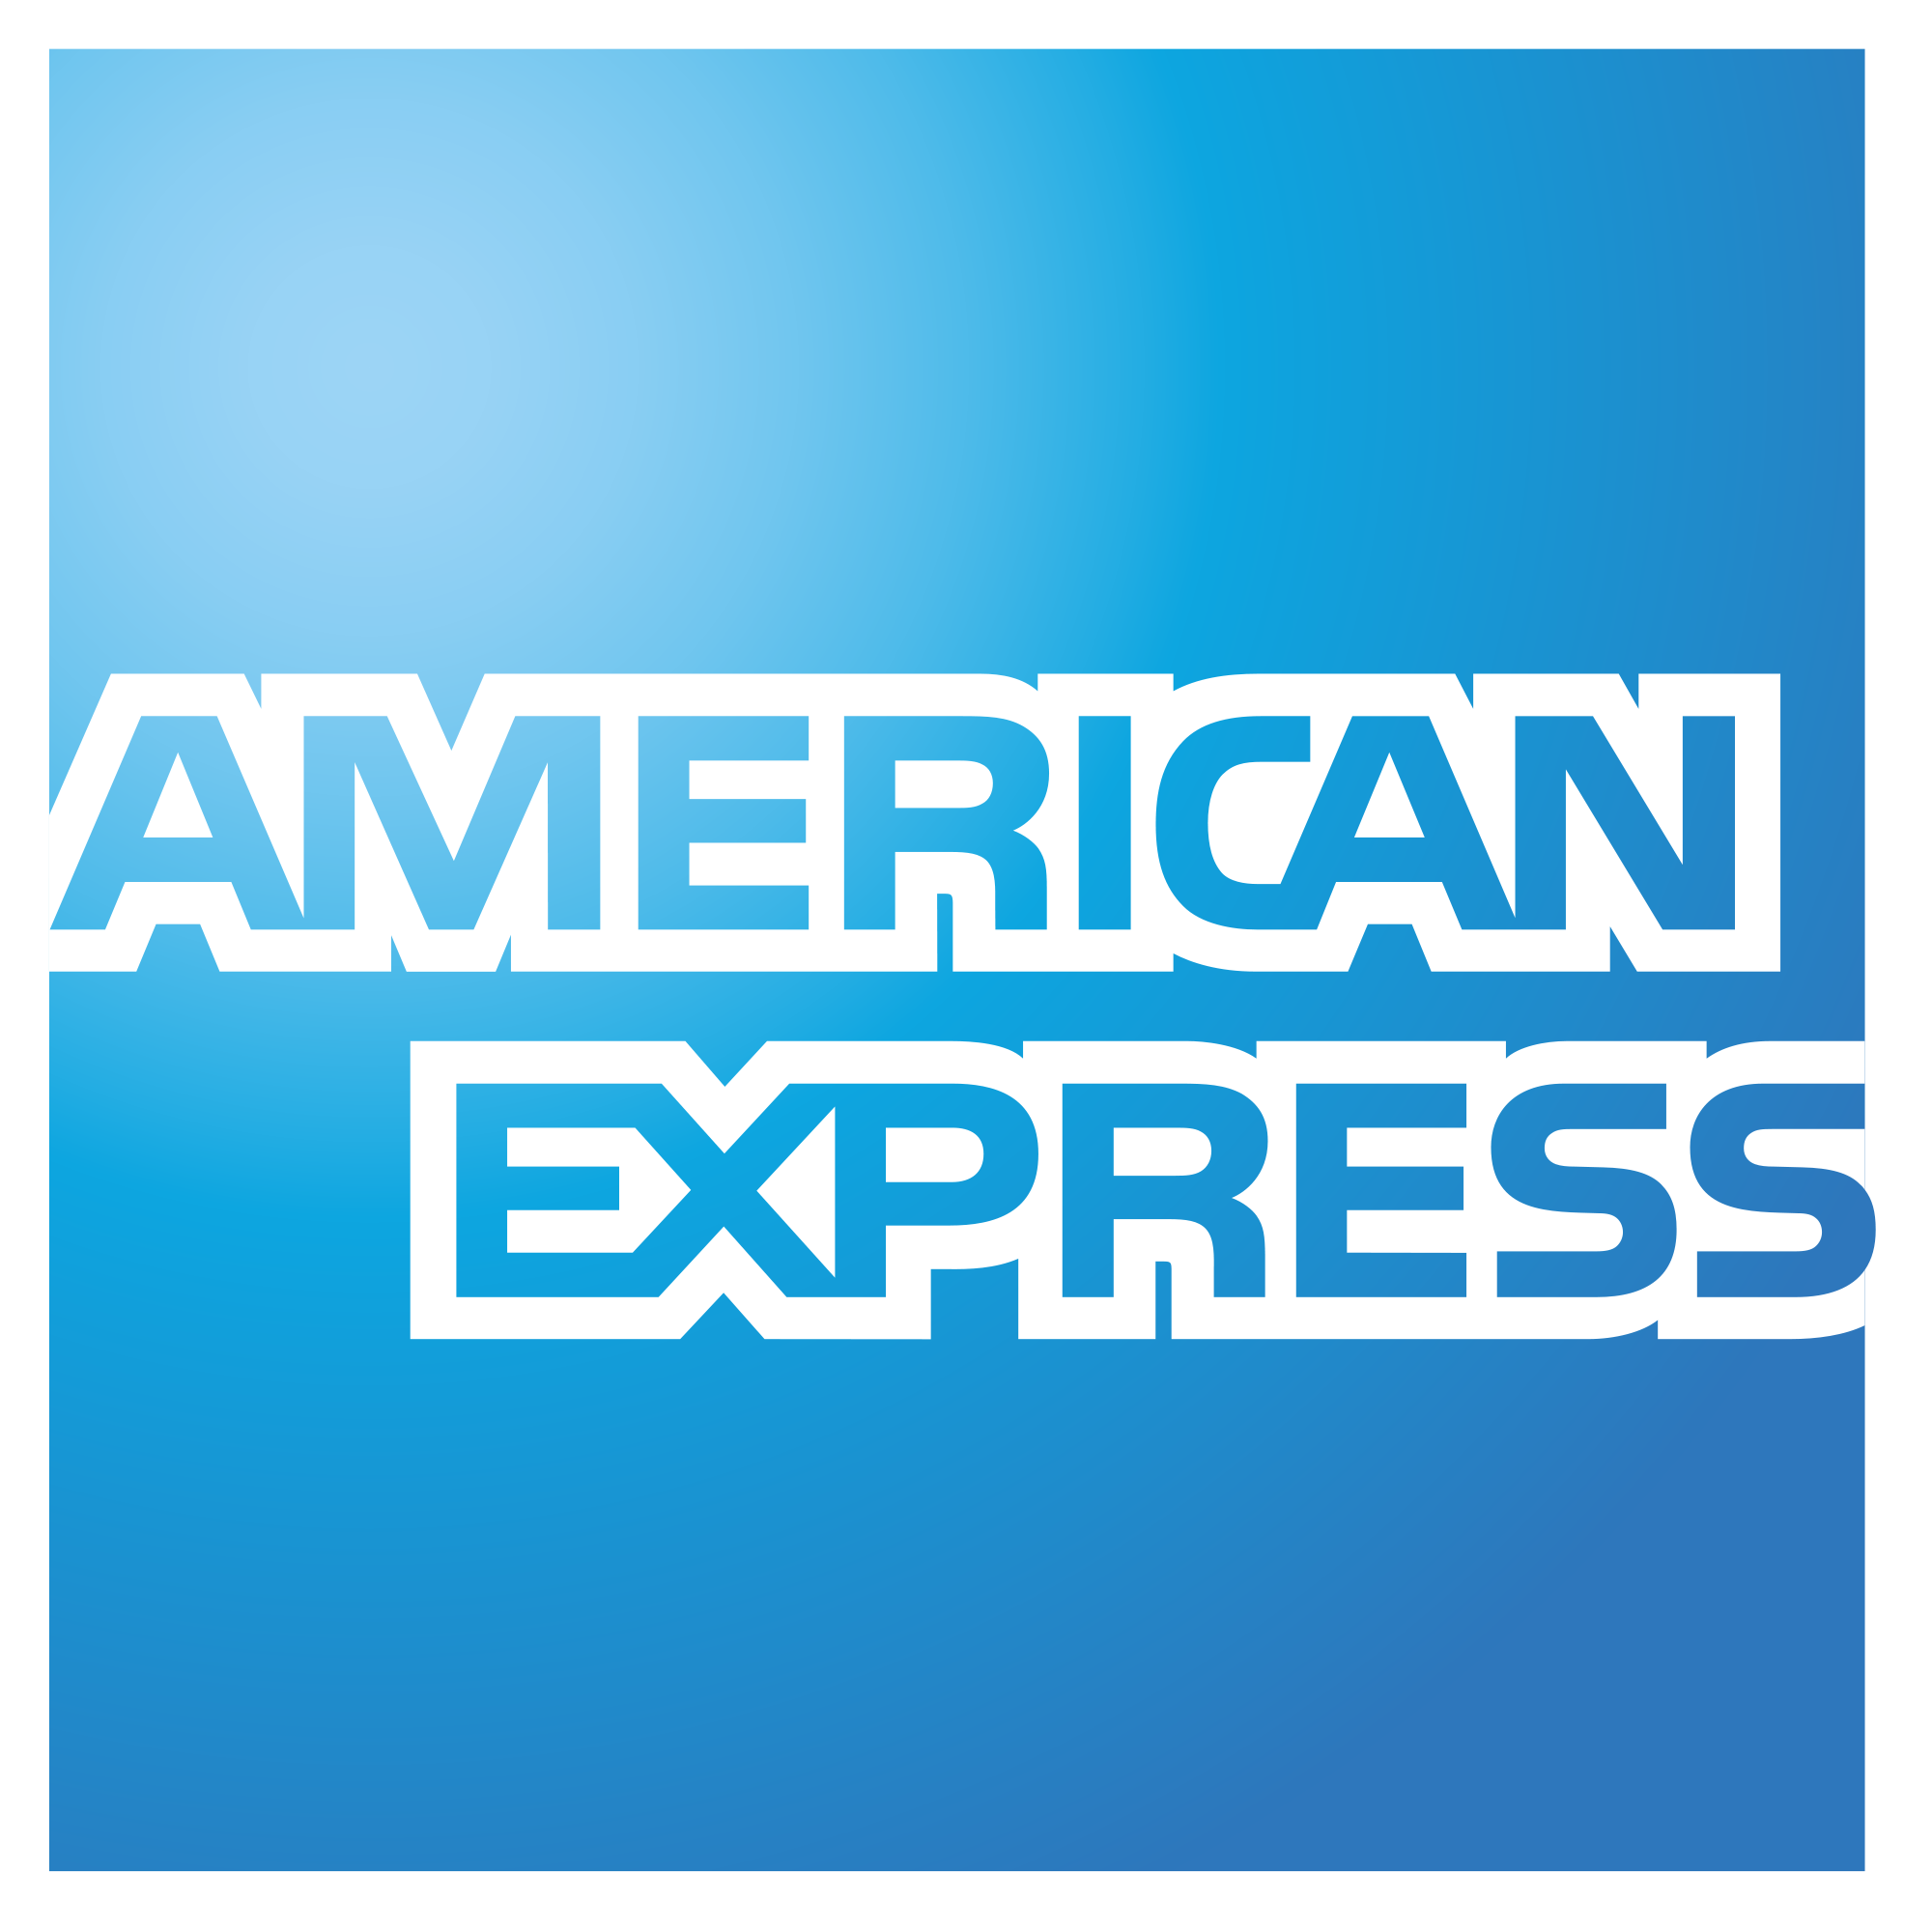 2000px-American_Express_logo.png